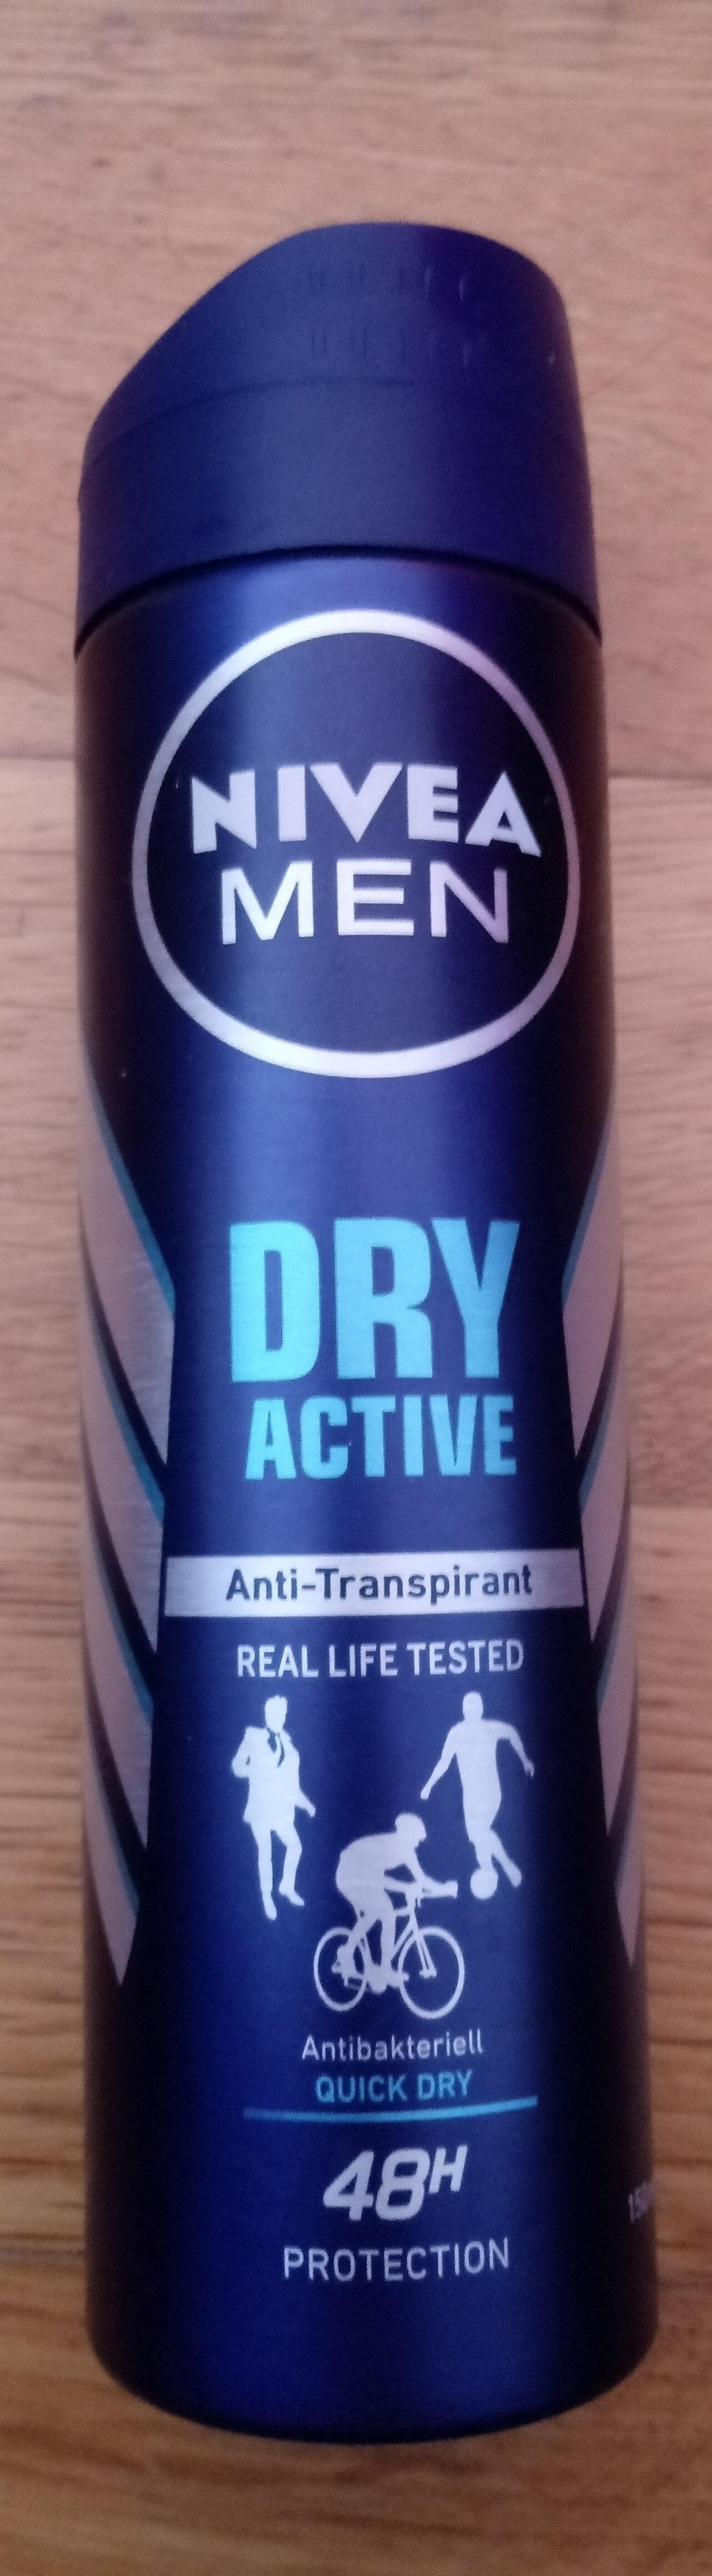 Dry Active Anti-Transpirant - Product - de